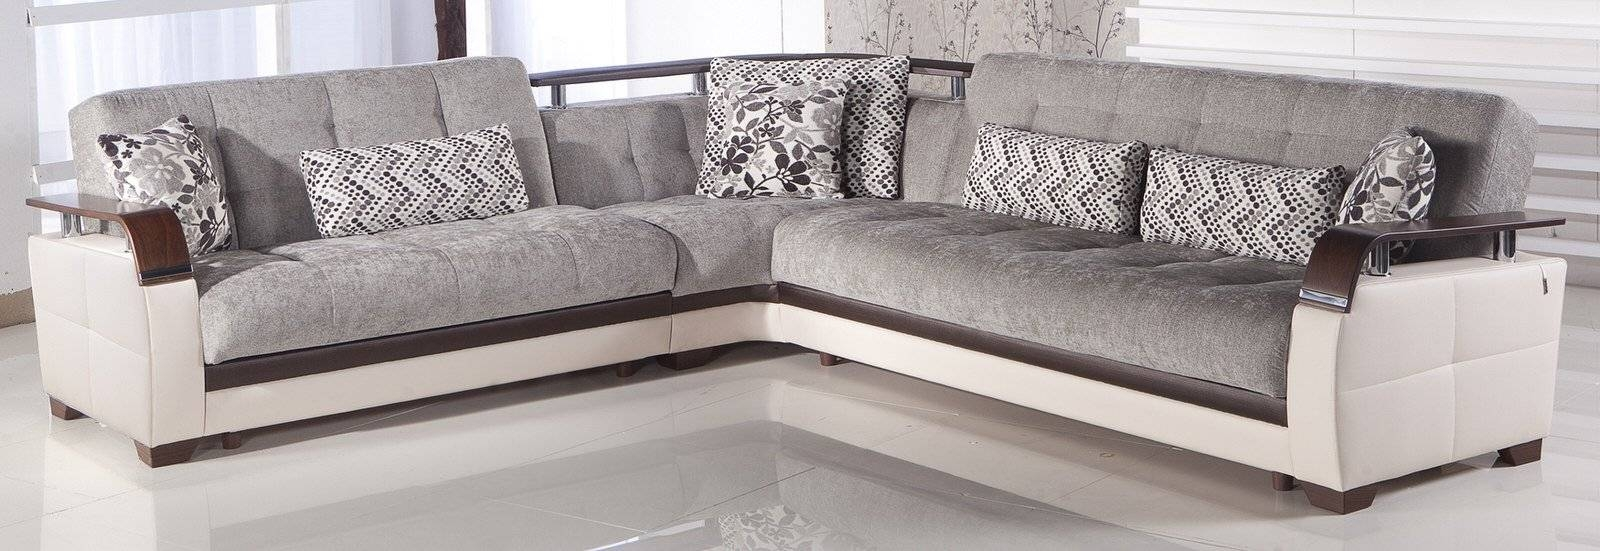 Sofas Center : Grey Sofa Set Unusual Picture Design Gray Free for Unusual Sofa (Image 9 of 23)